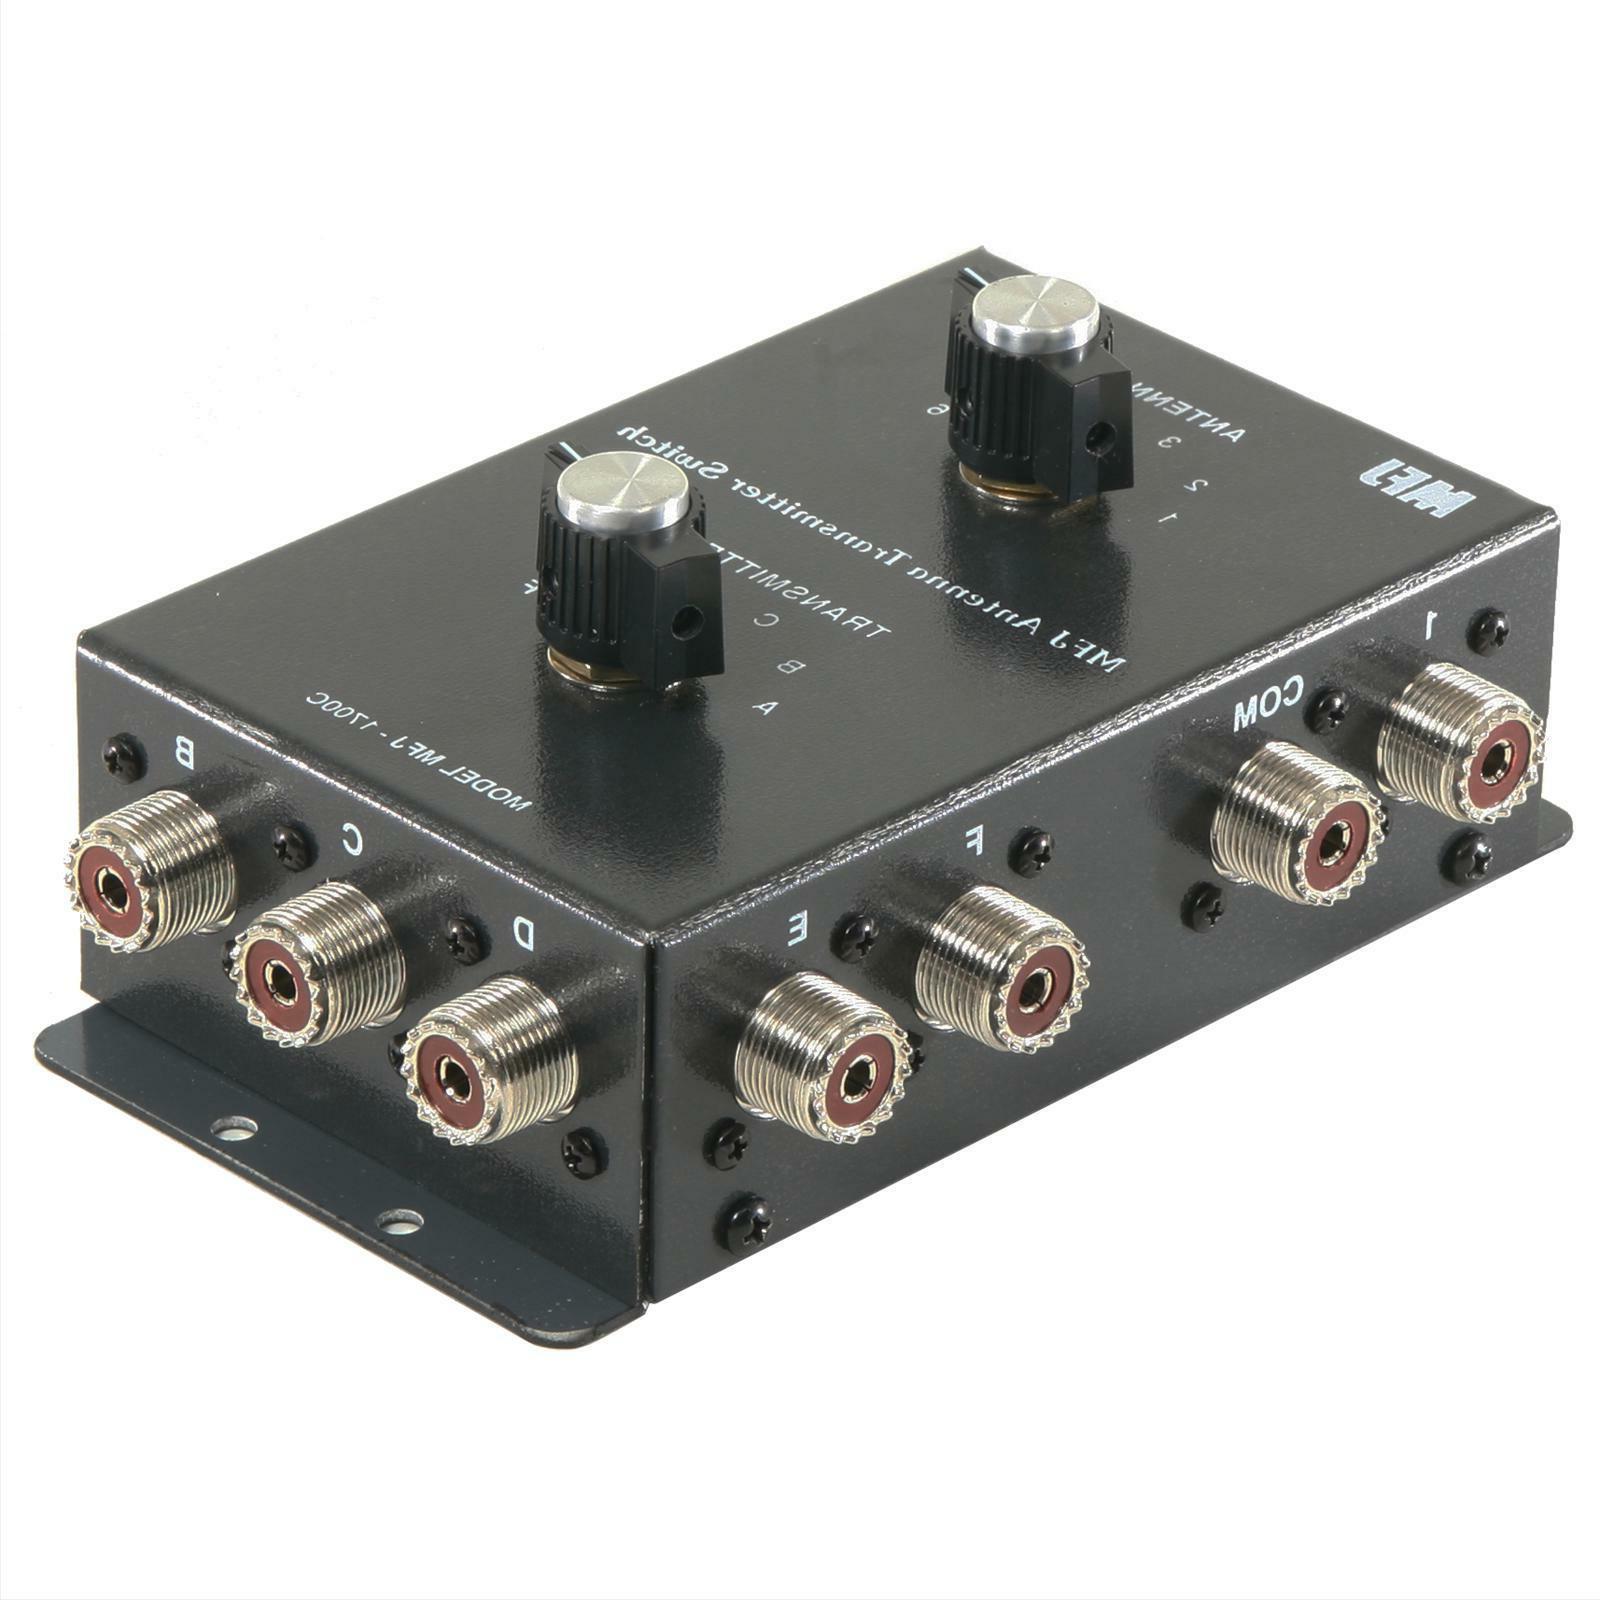 MFJ-1700C Antenna-Radio Switch 2kW